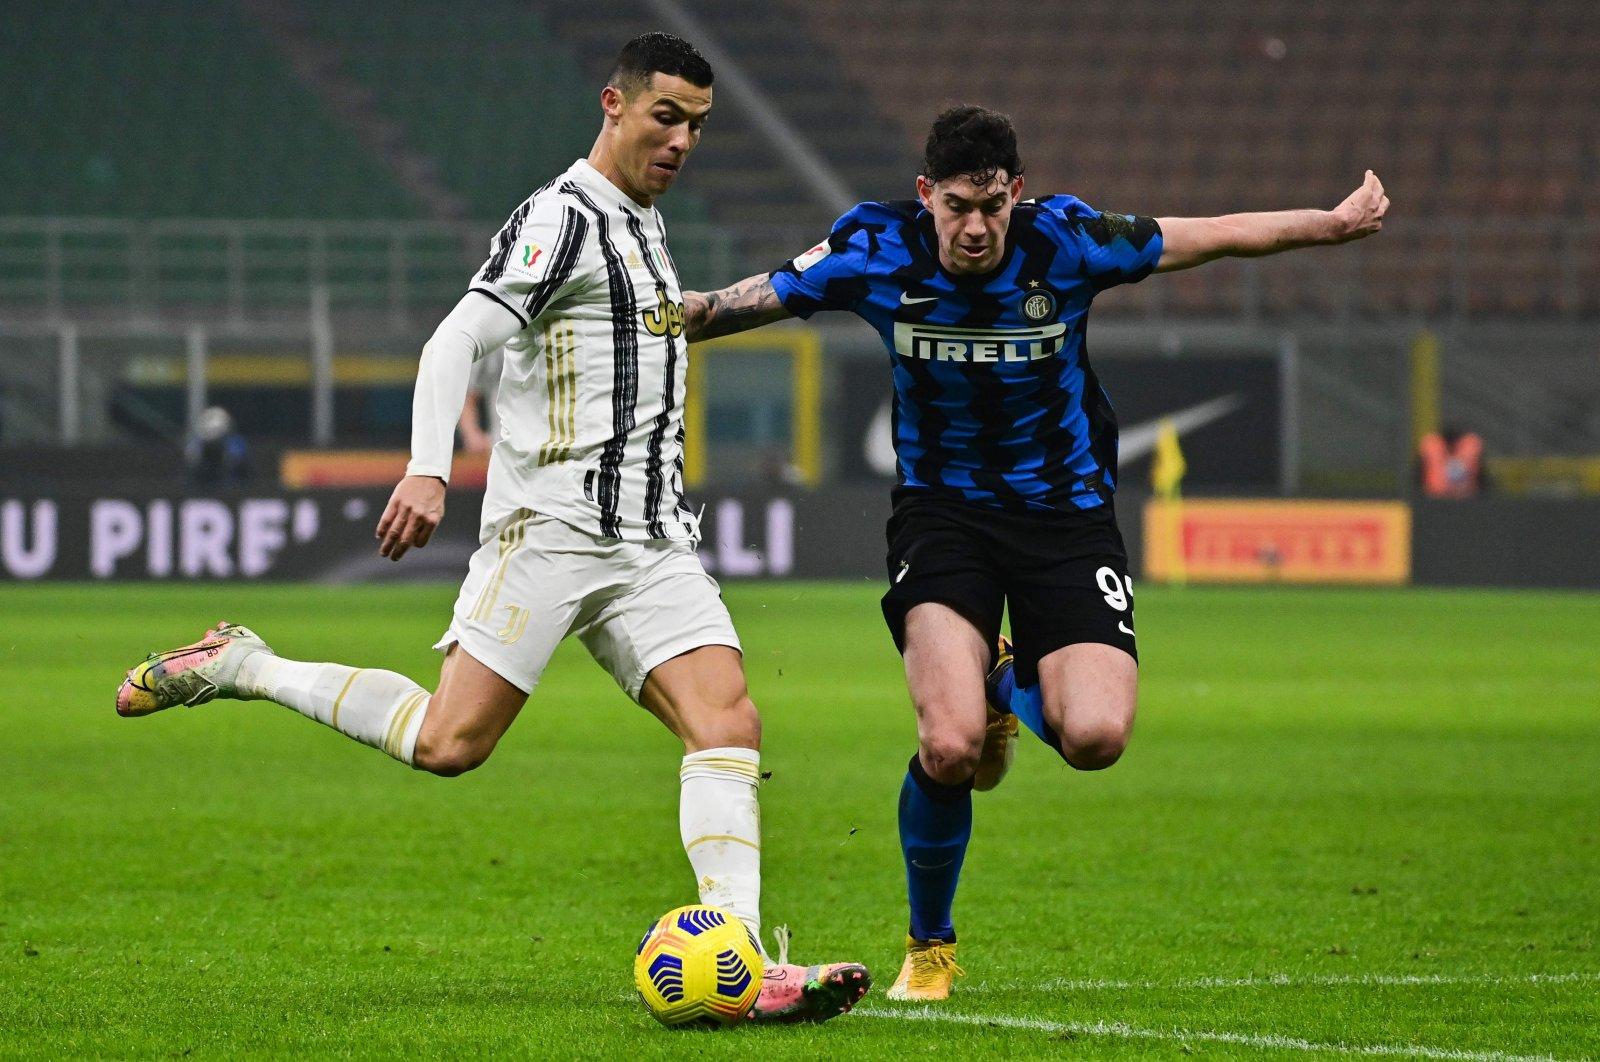 Juventus forward Cristiano Ronaldo (L) challenges Inter Milan defender Alessandro Bastoni during the Italian Cup semifinal first leg at the San Siro, Milan, Italy, Feb. 2, 2021. (AFP Photo)